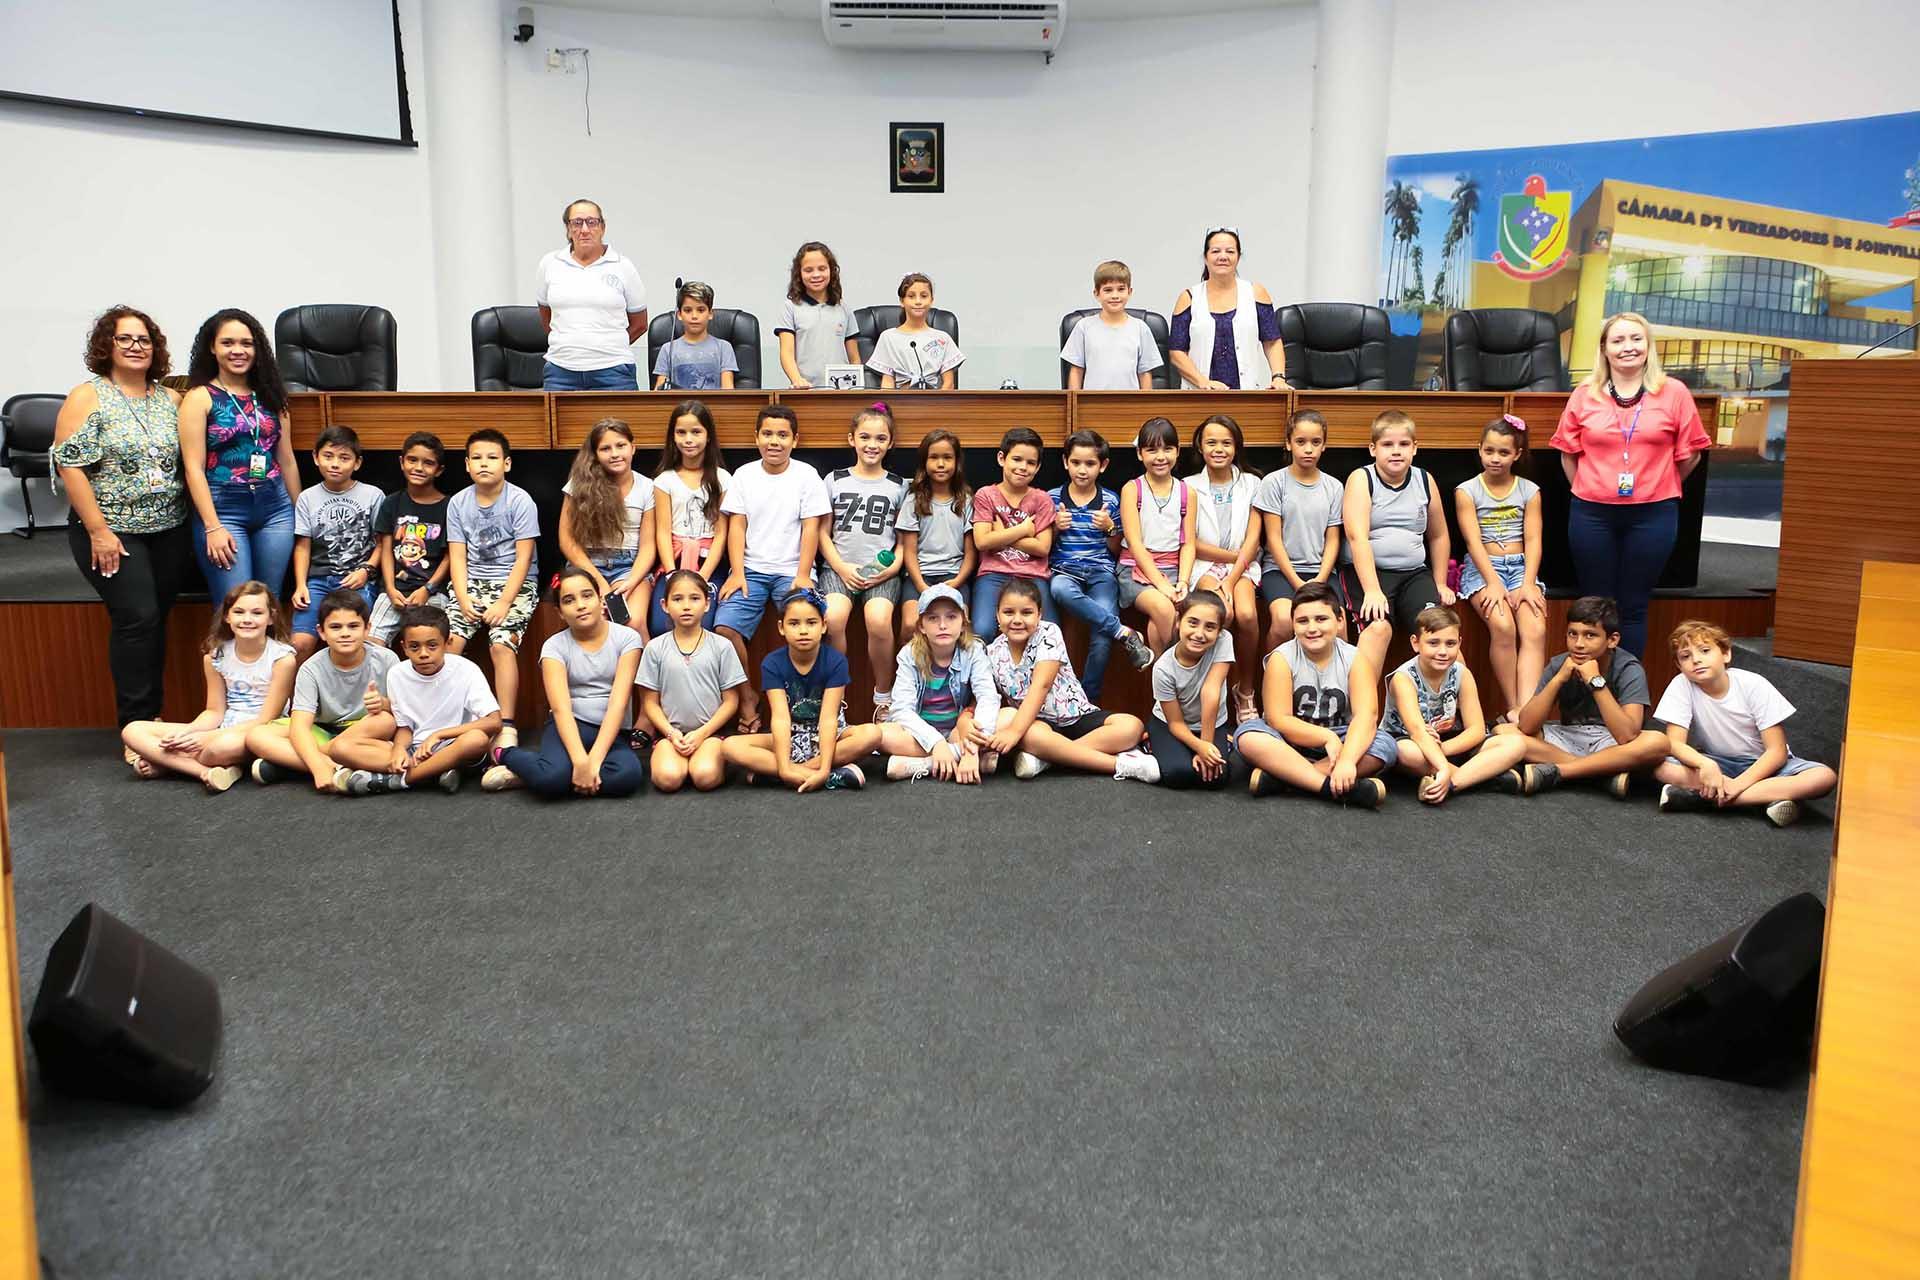 Alunos do quarto ano da Escola Estadual Juracy Maria Brosig visitaram a Câmara de Joinville |  Foto Mauro Arthur Schlieck/CVJ